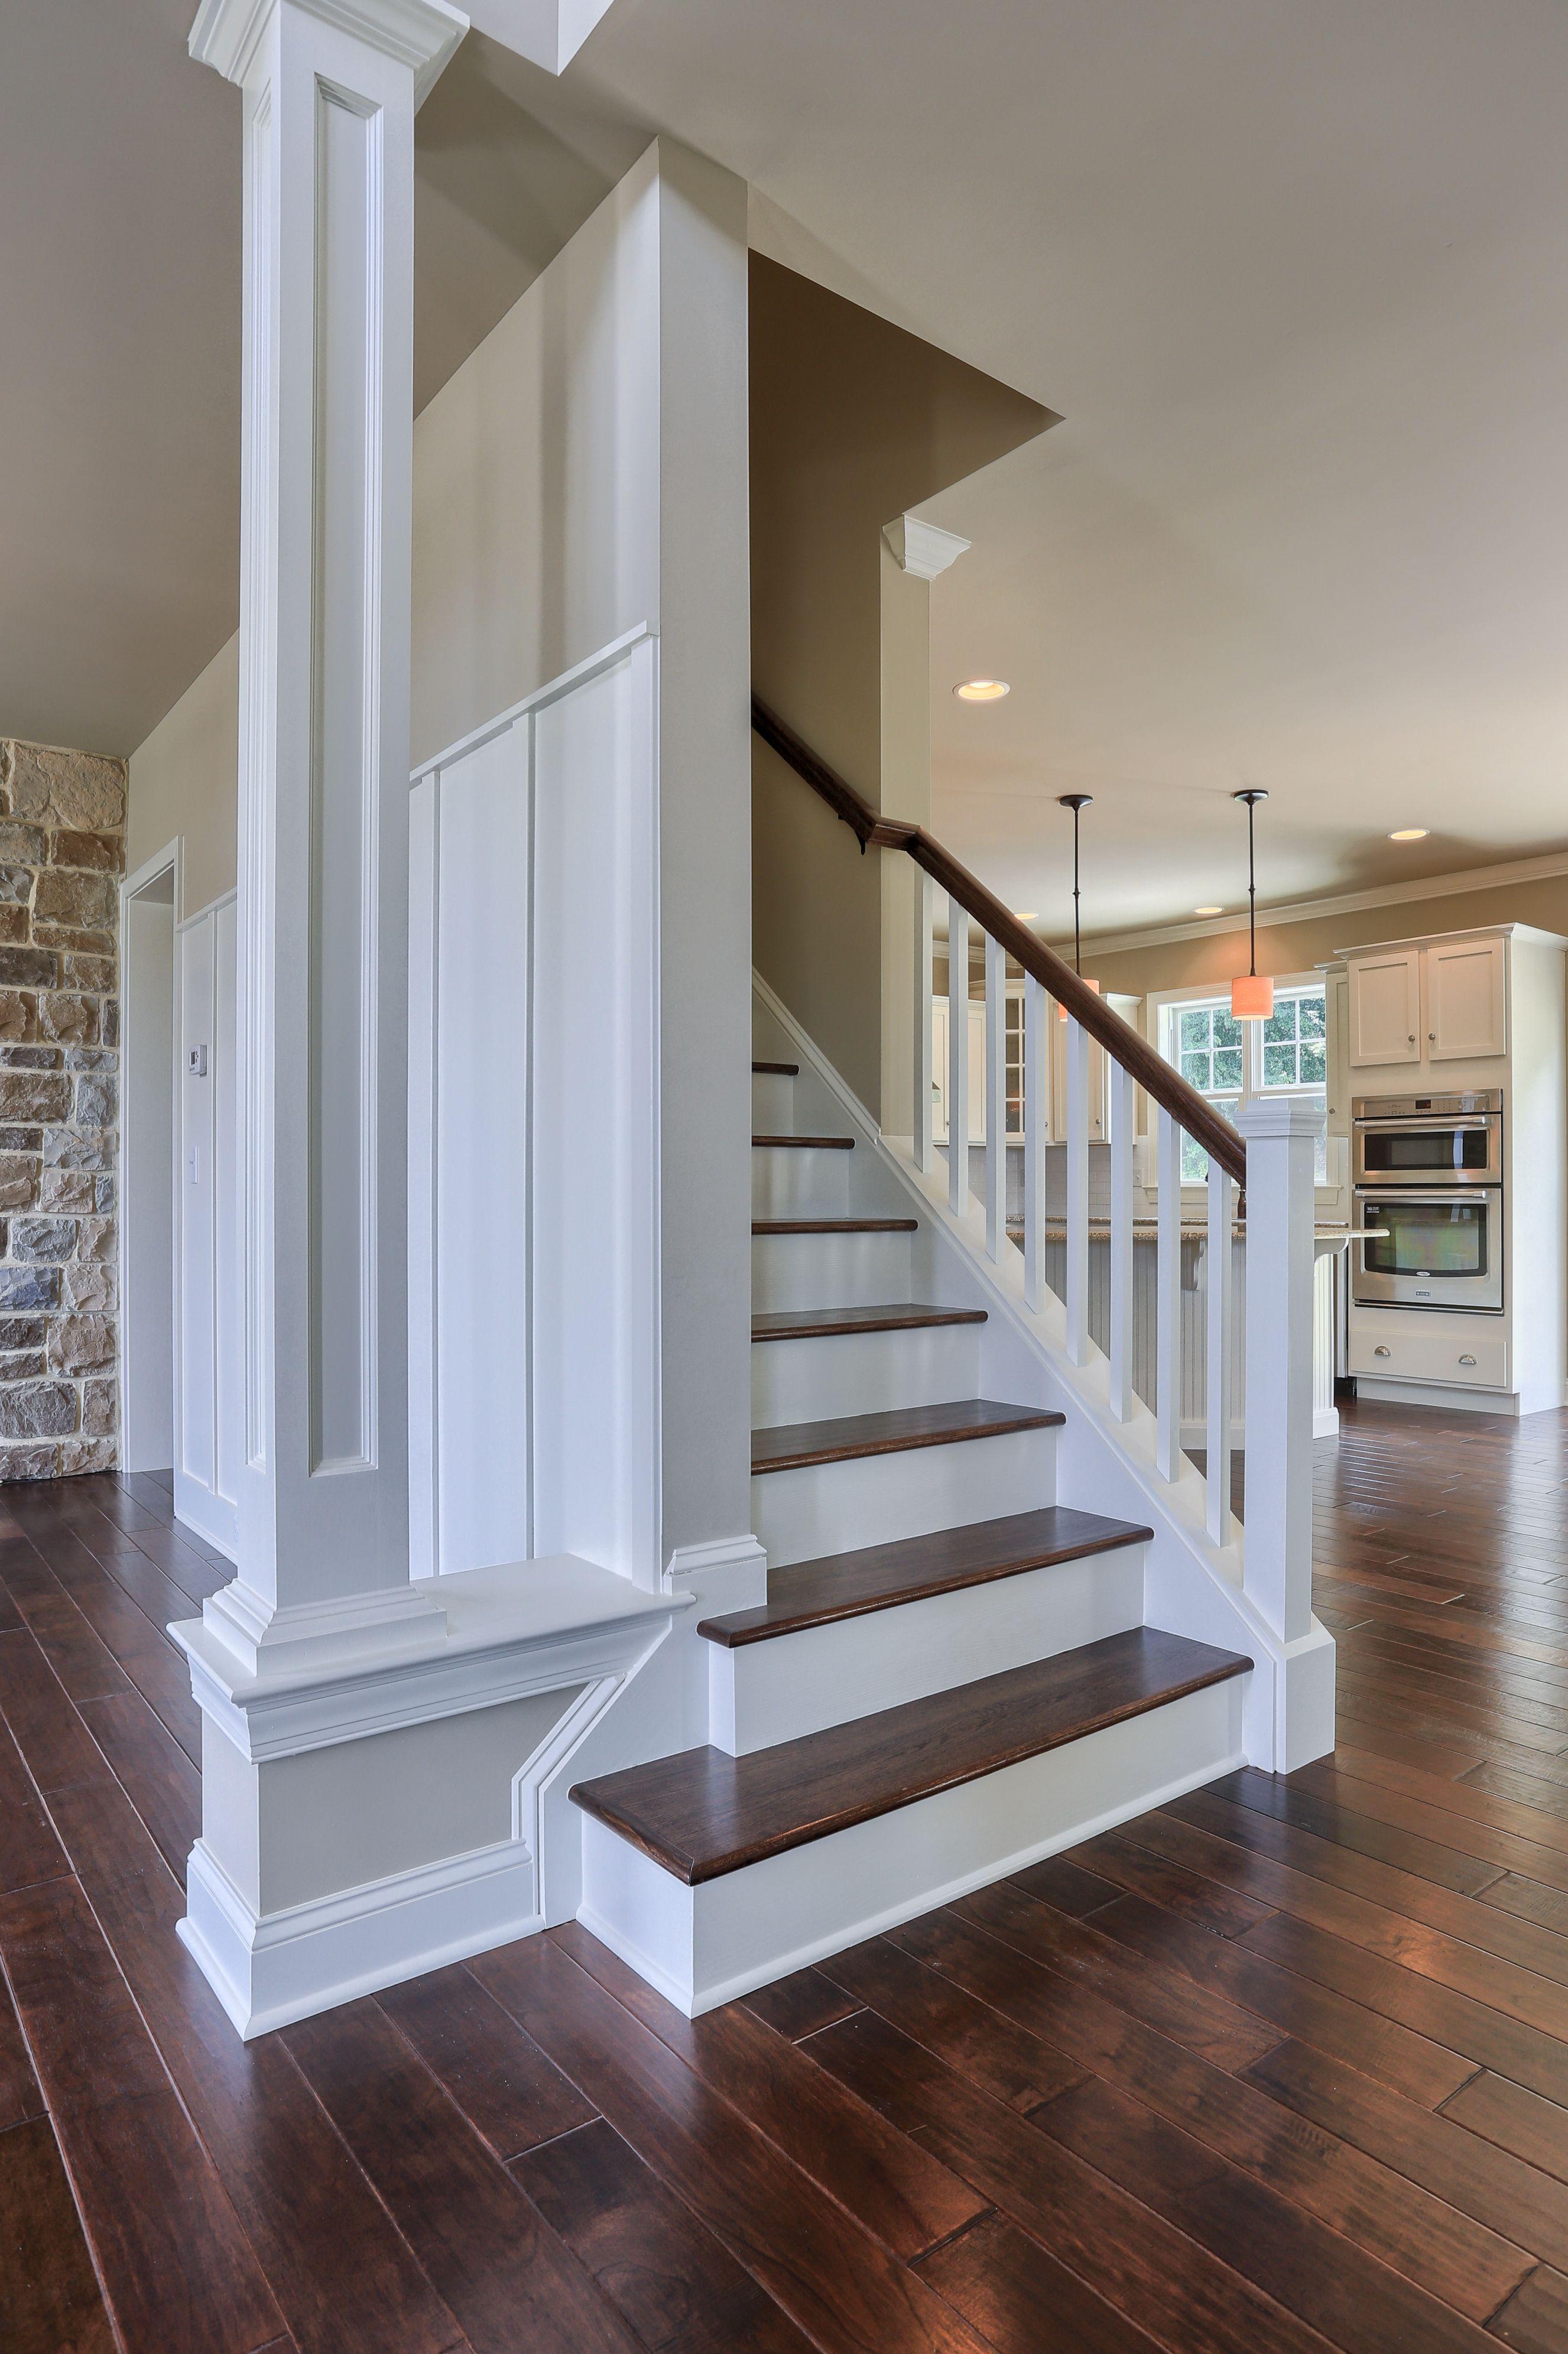 Unique Home Interior Designs: Pin By Garman Builders Design Studio On 350-D Interior